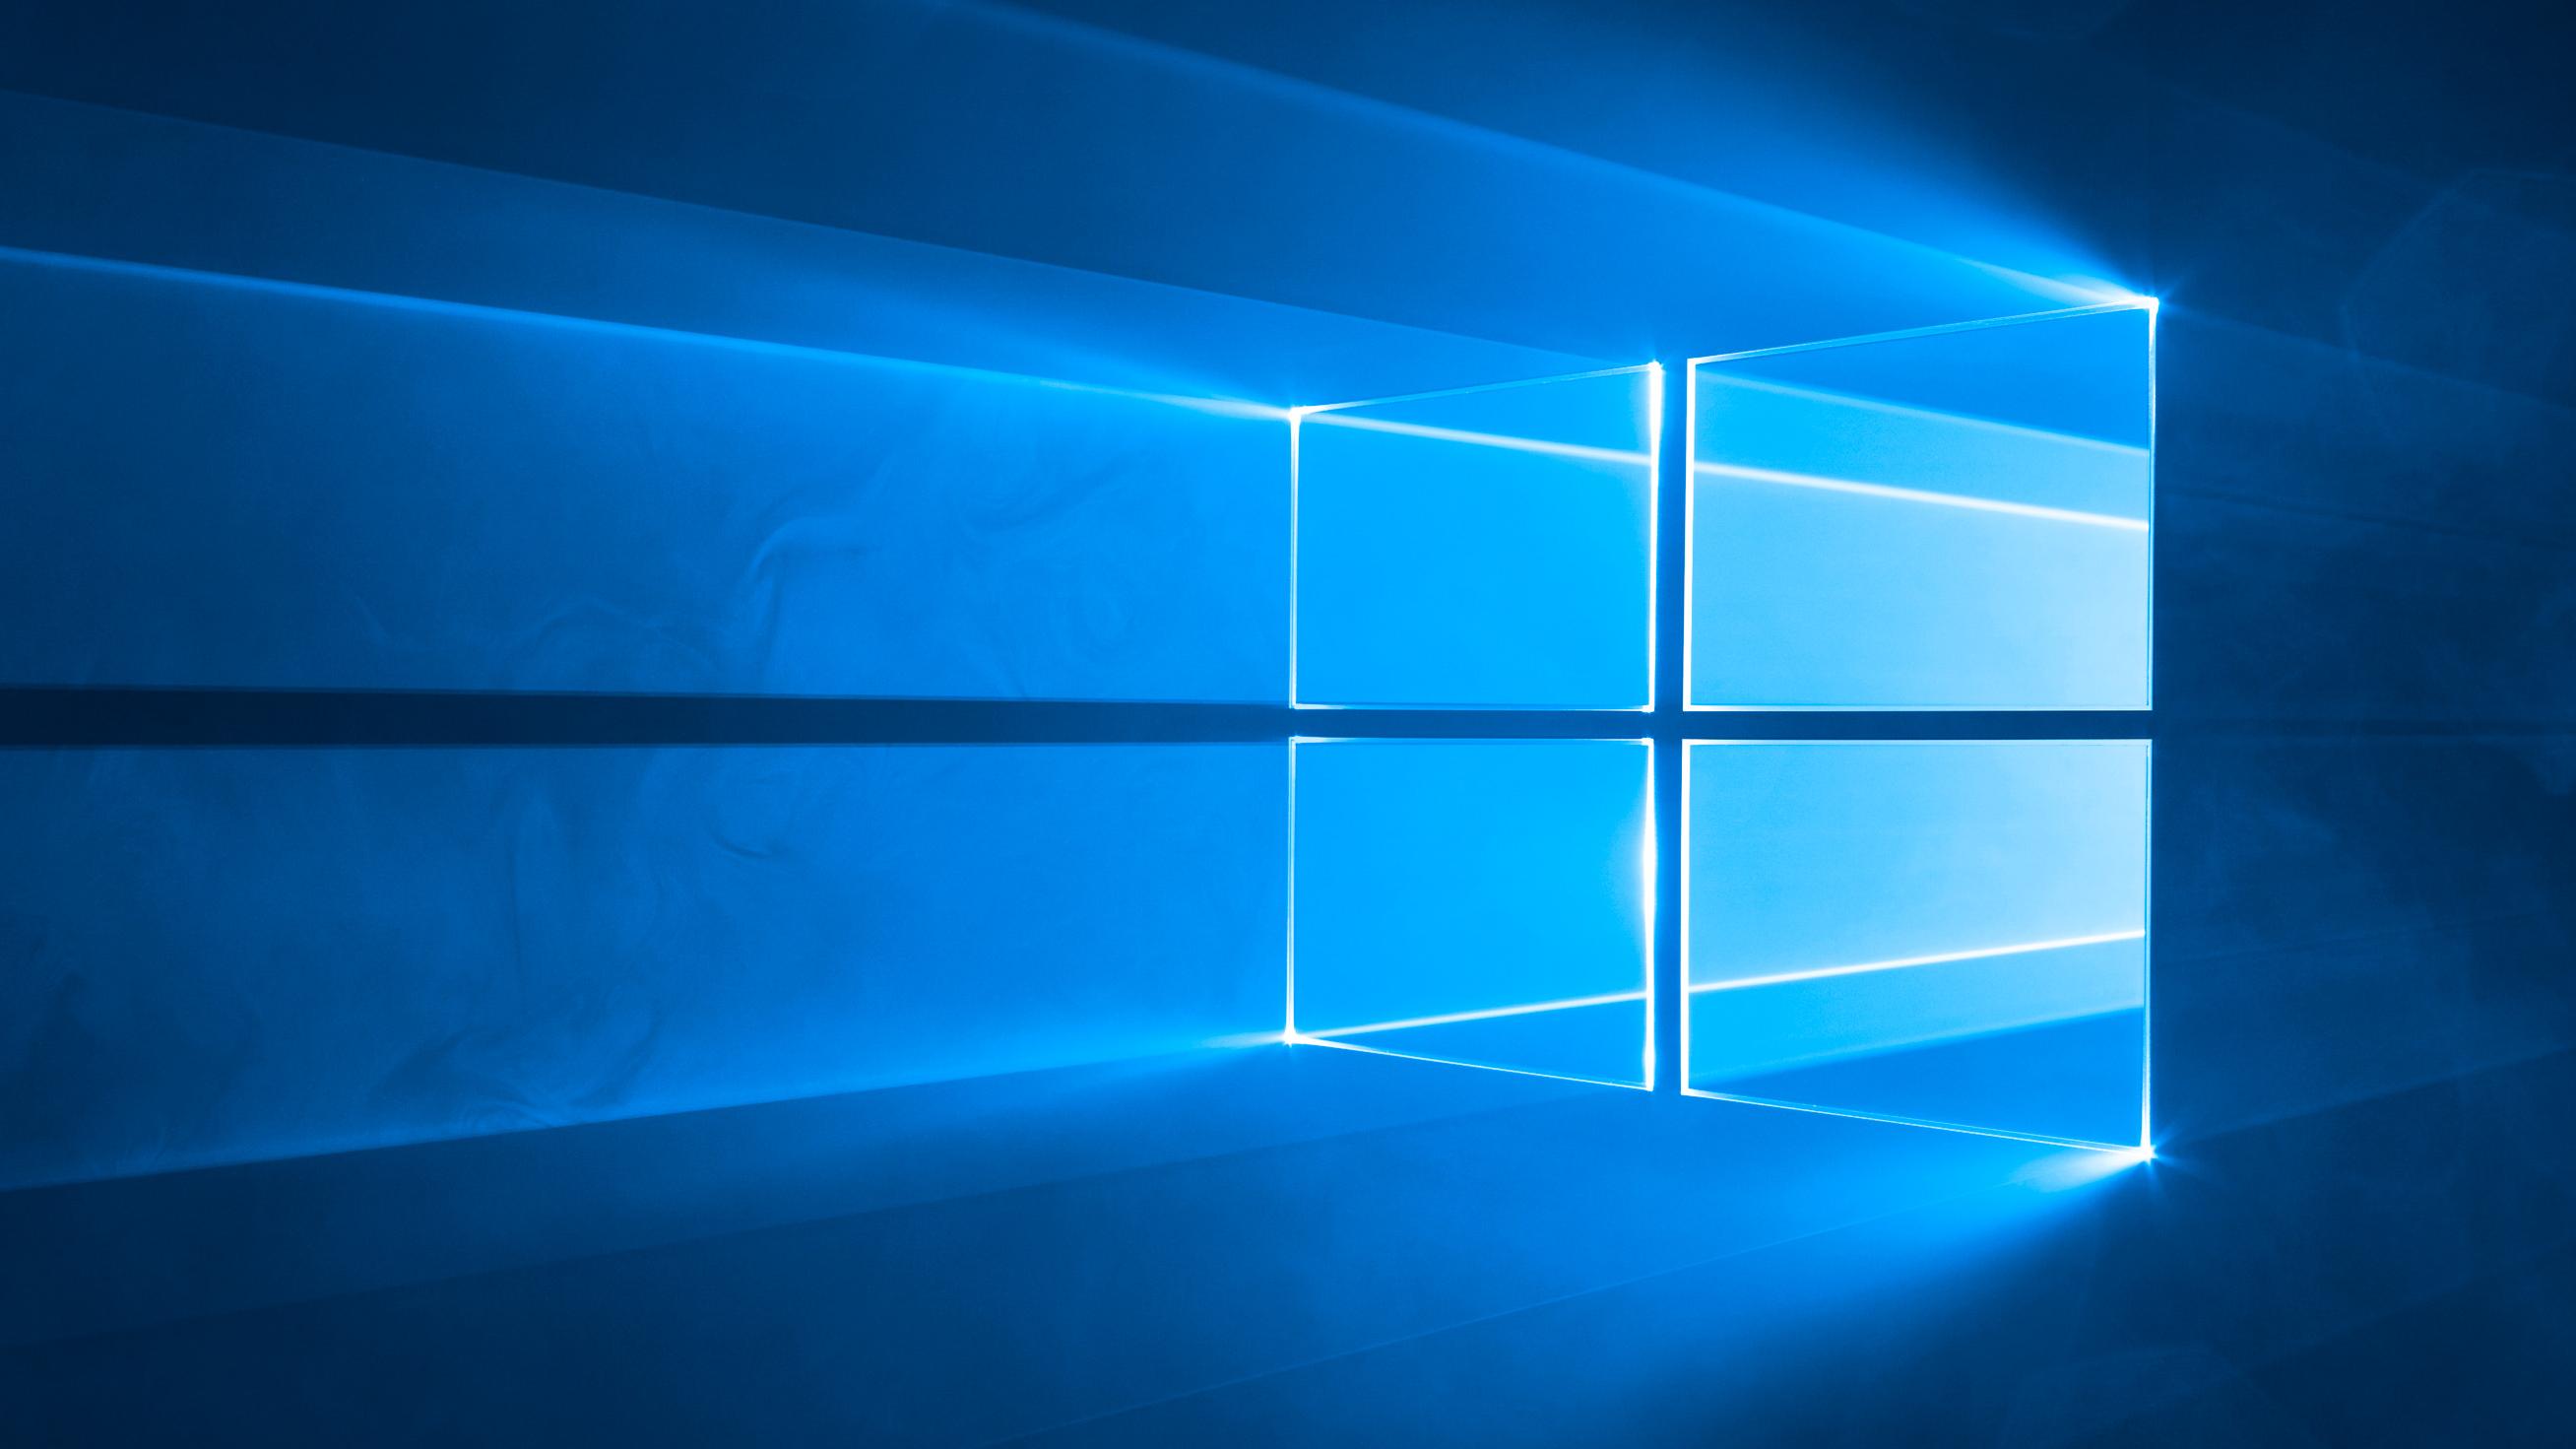 Windows 10's original desktop background.